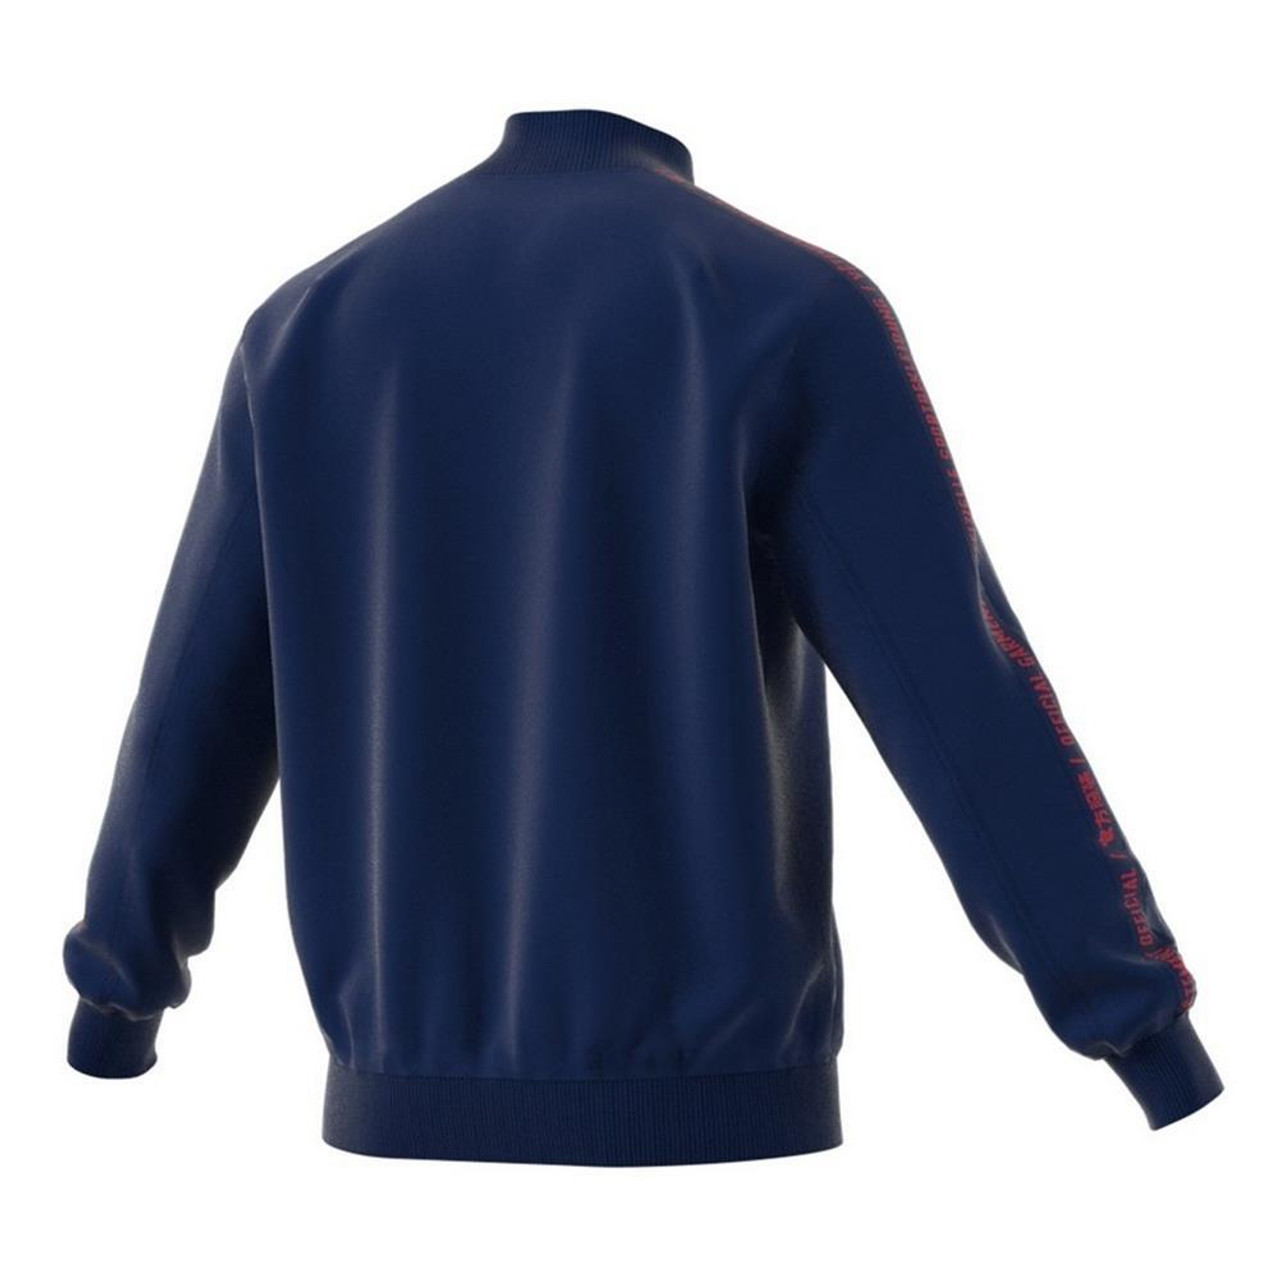 FC Dallas Anthem Jacket Official Adidas Full-Zip